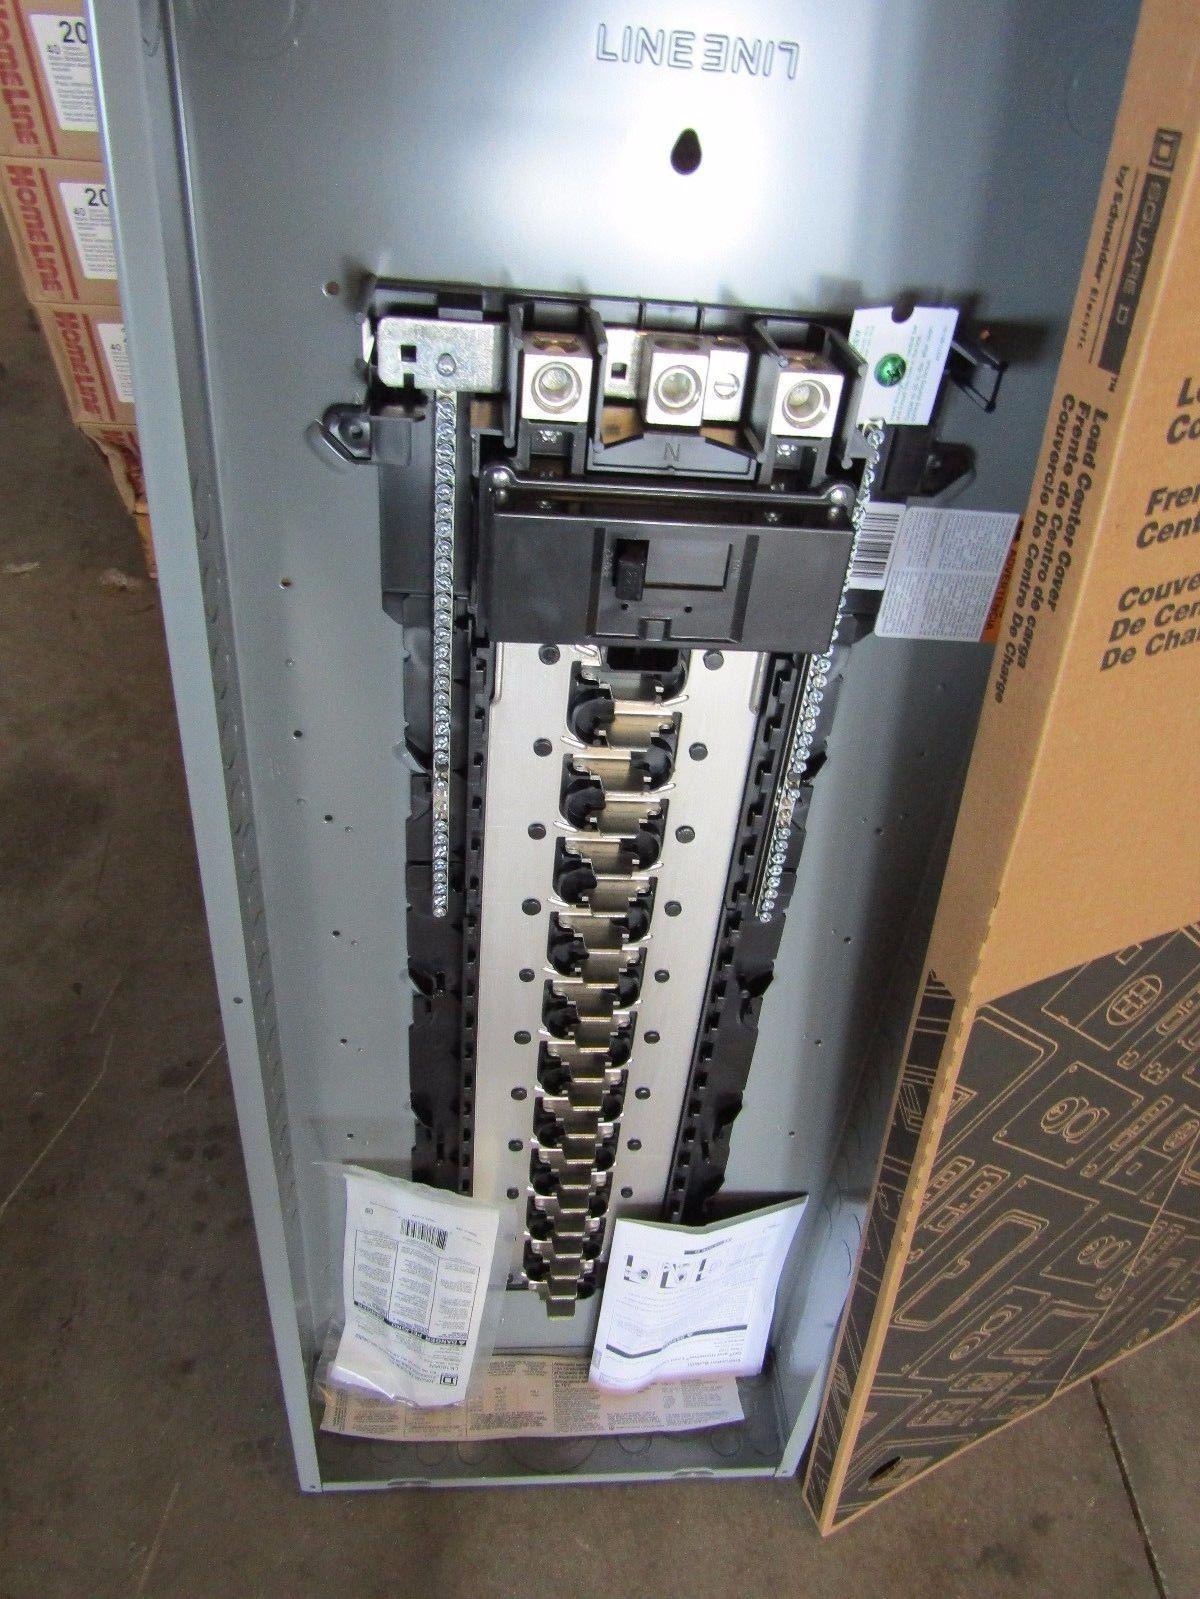 Square D 42 Circuit Panel Education Electrical Label 20 Amp Outlet On 15 Internachi Inspection Forum New Hom42m225c Ckt 225 Main Breaker Loadcenter